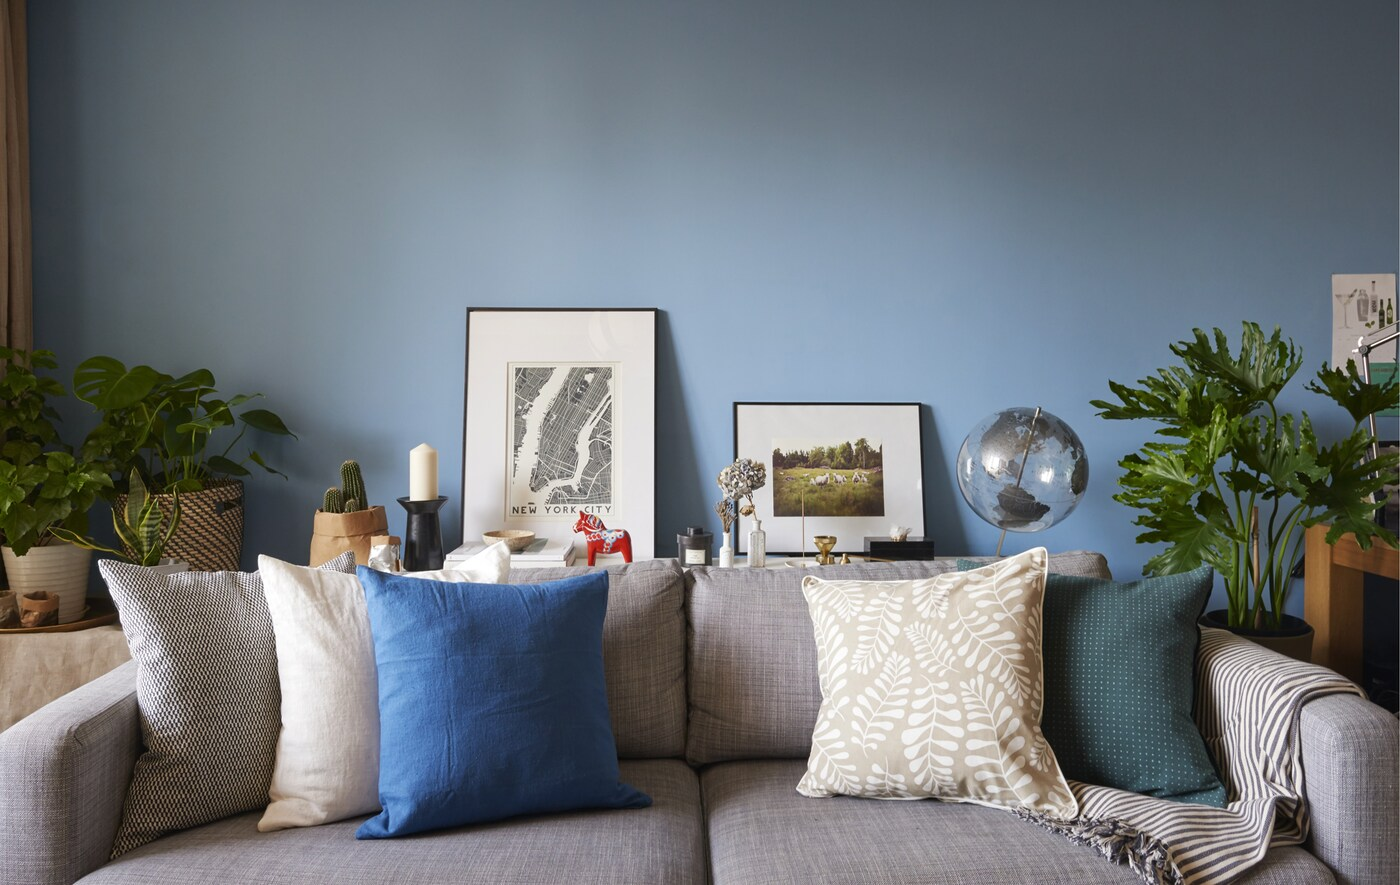 A grey sofa with cushions against a blue wall.